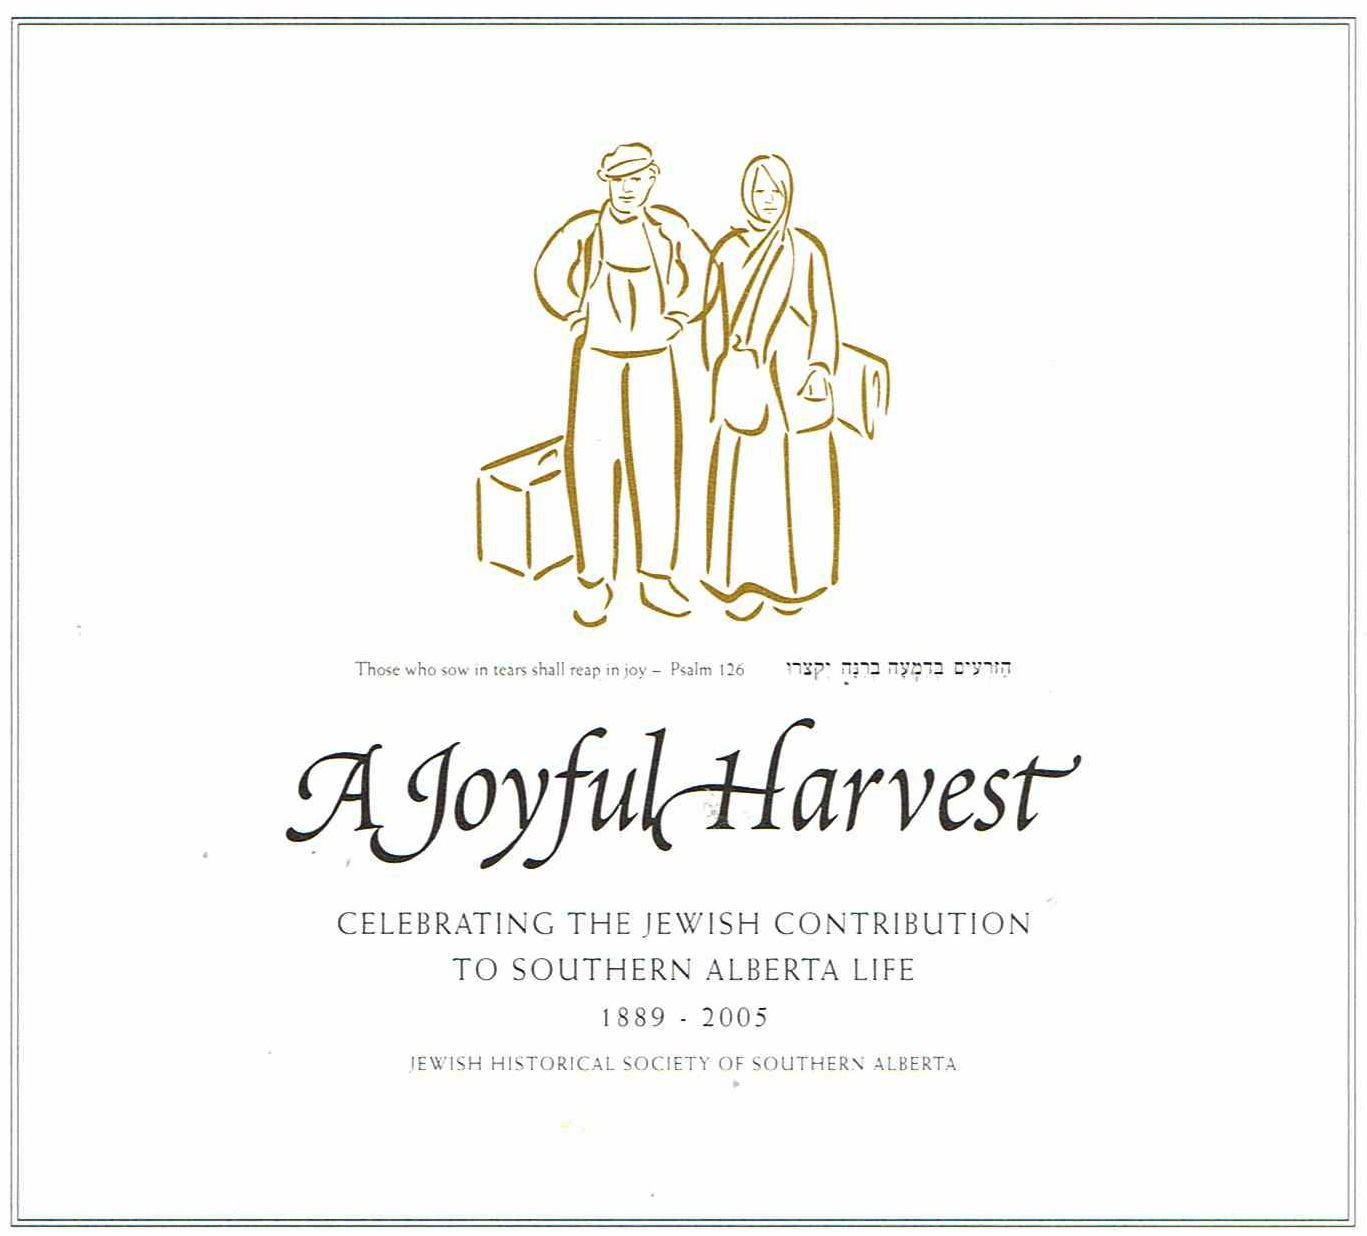 A Joyful Harvest